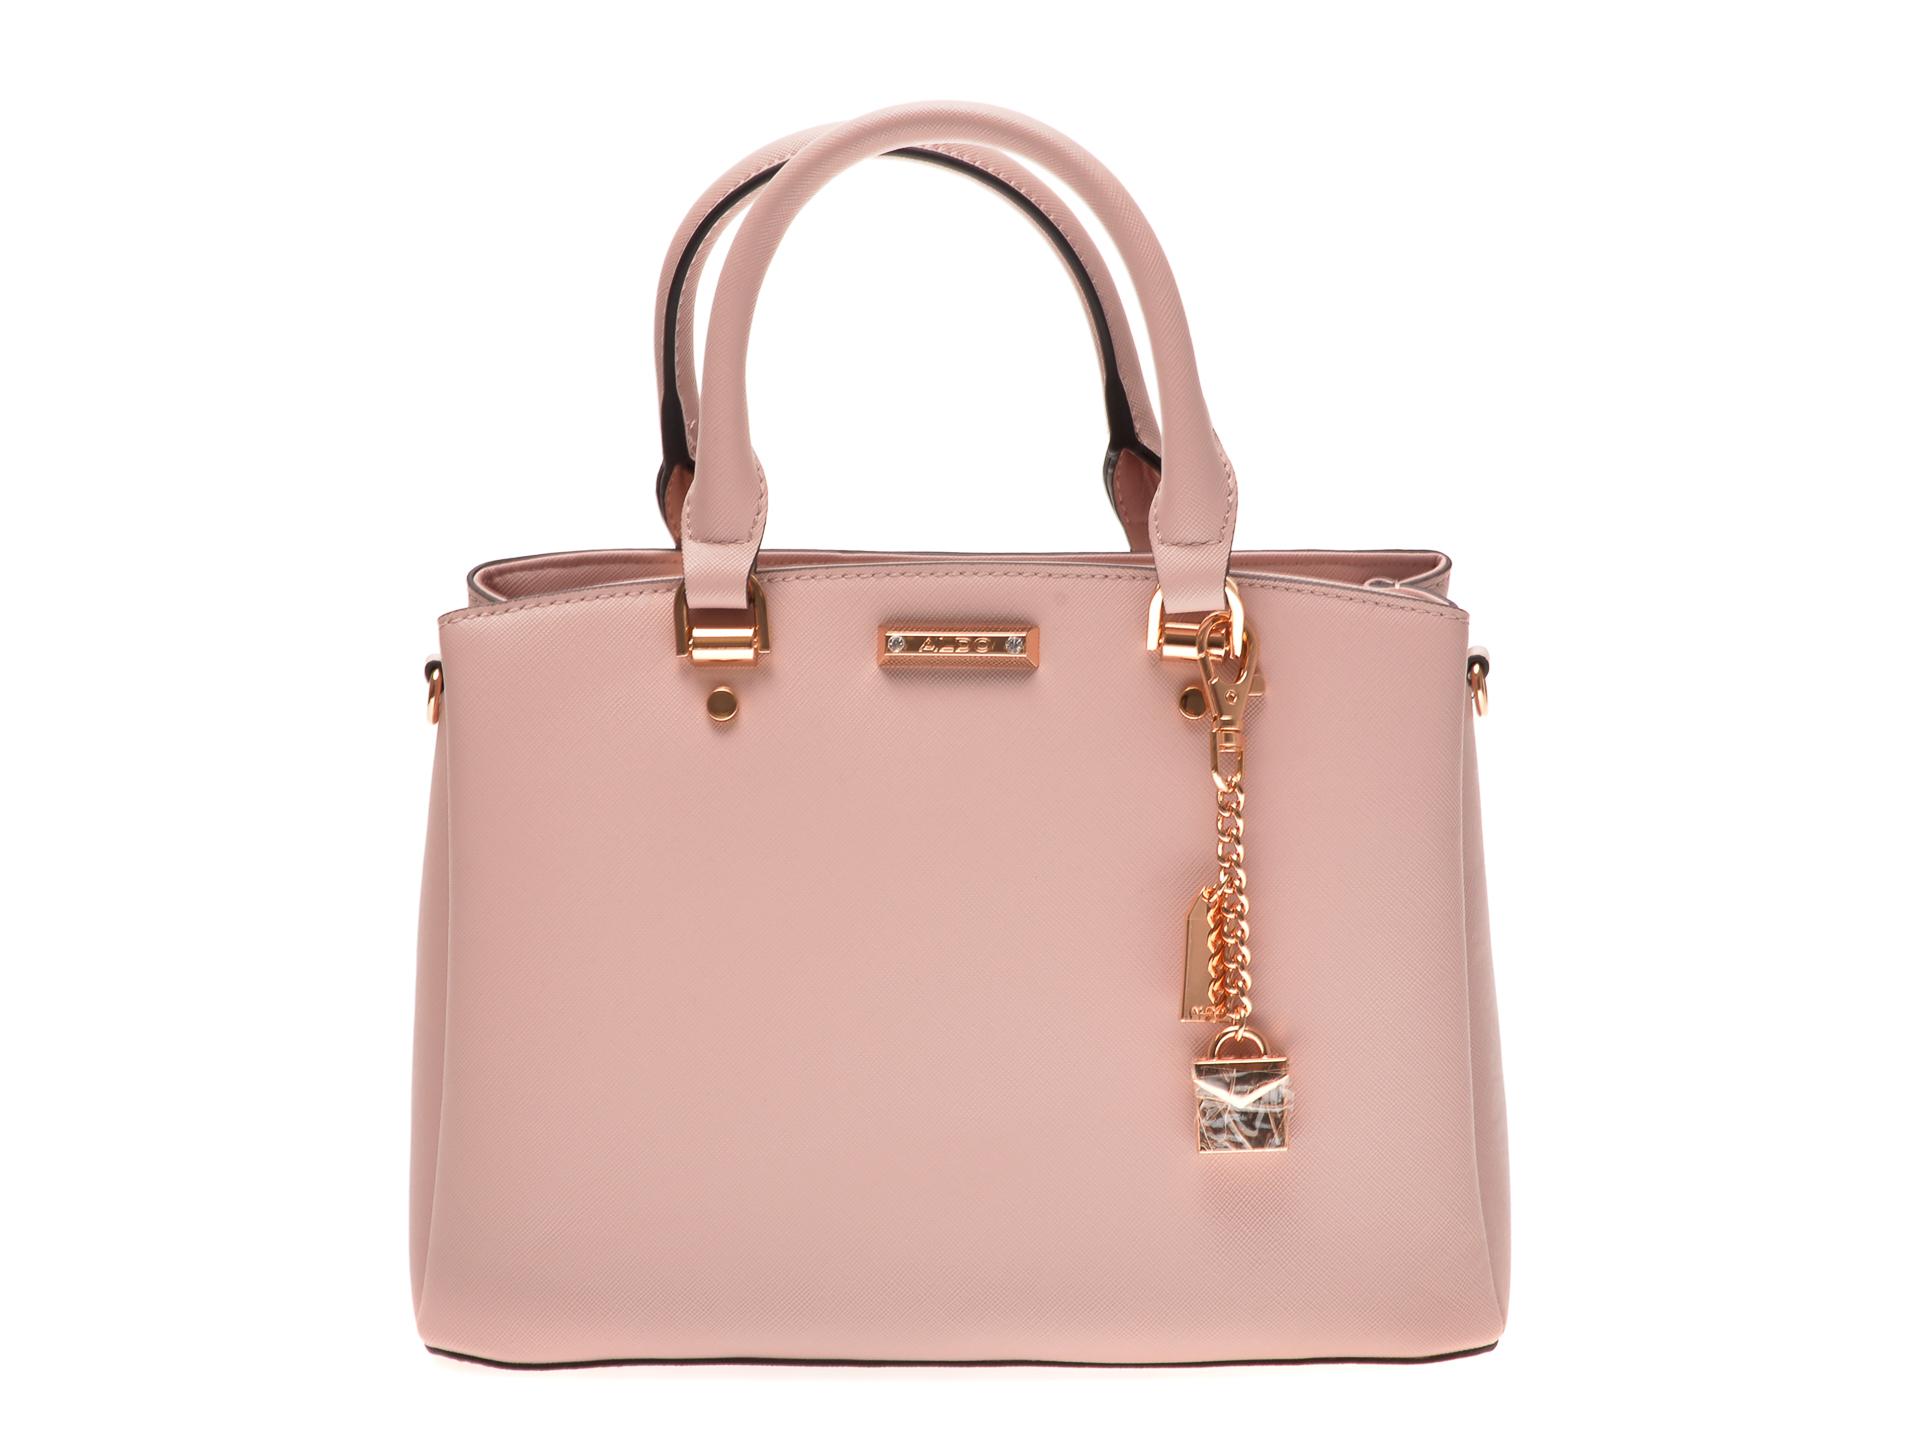 Poseta ALDO roz, Papasula680, din piele ecologica imagine